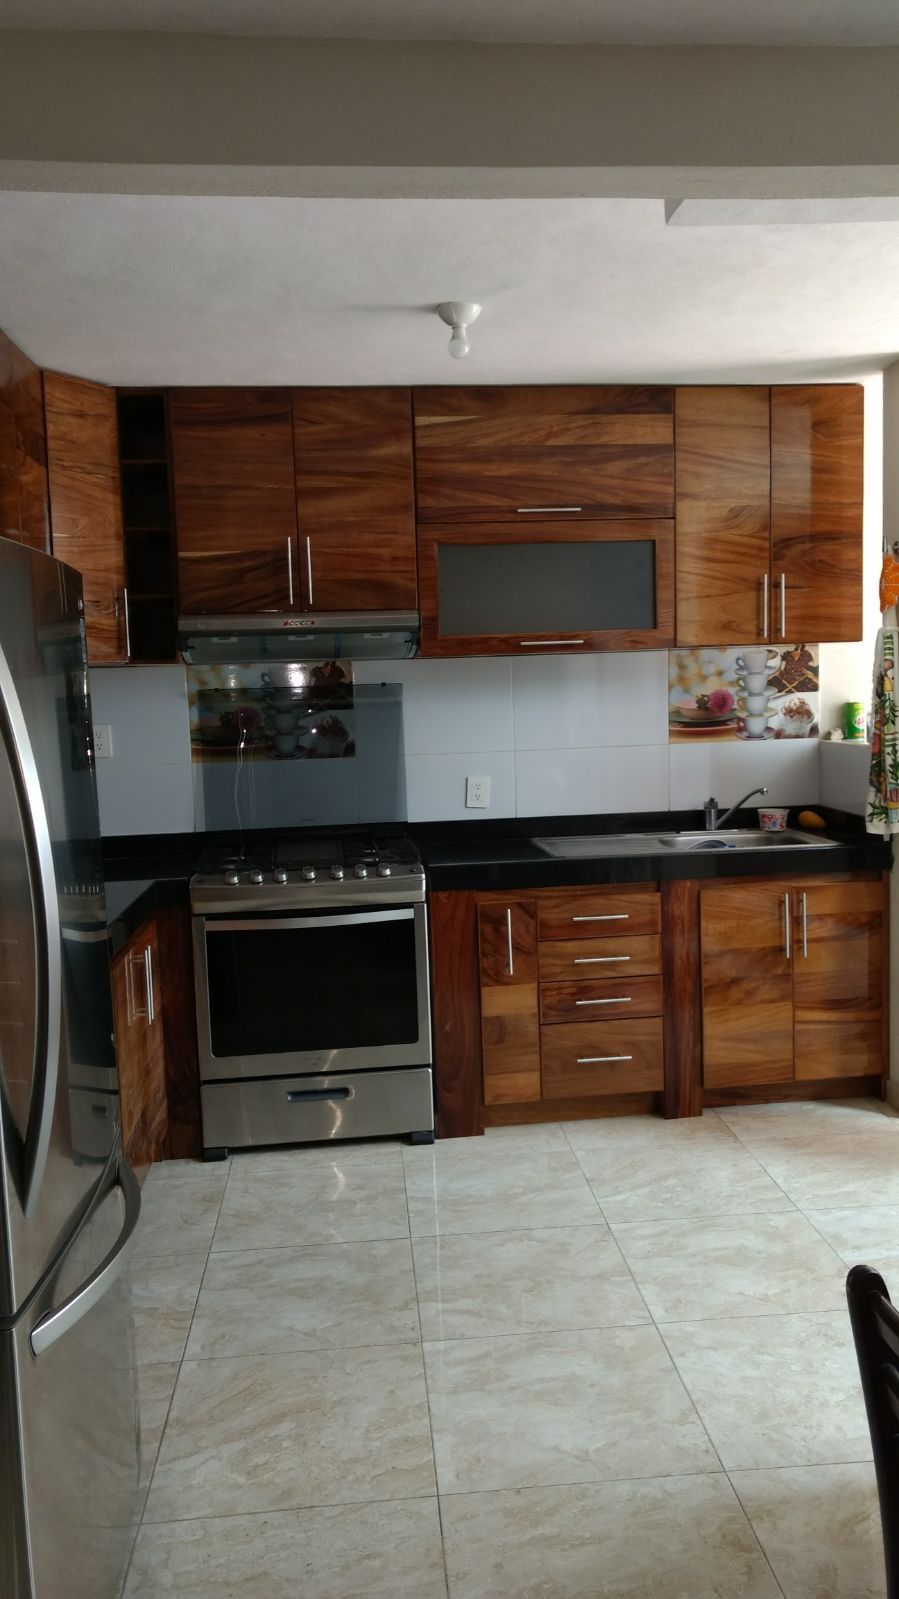 Cocina en madera de parota  cocinas en 2019  Cocinas